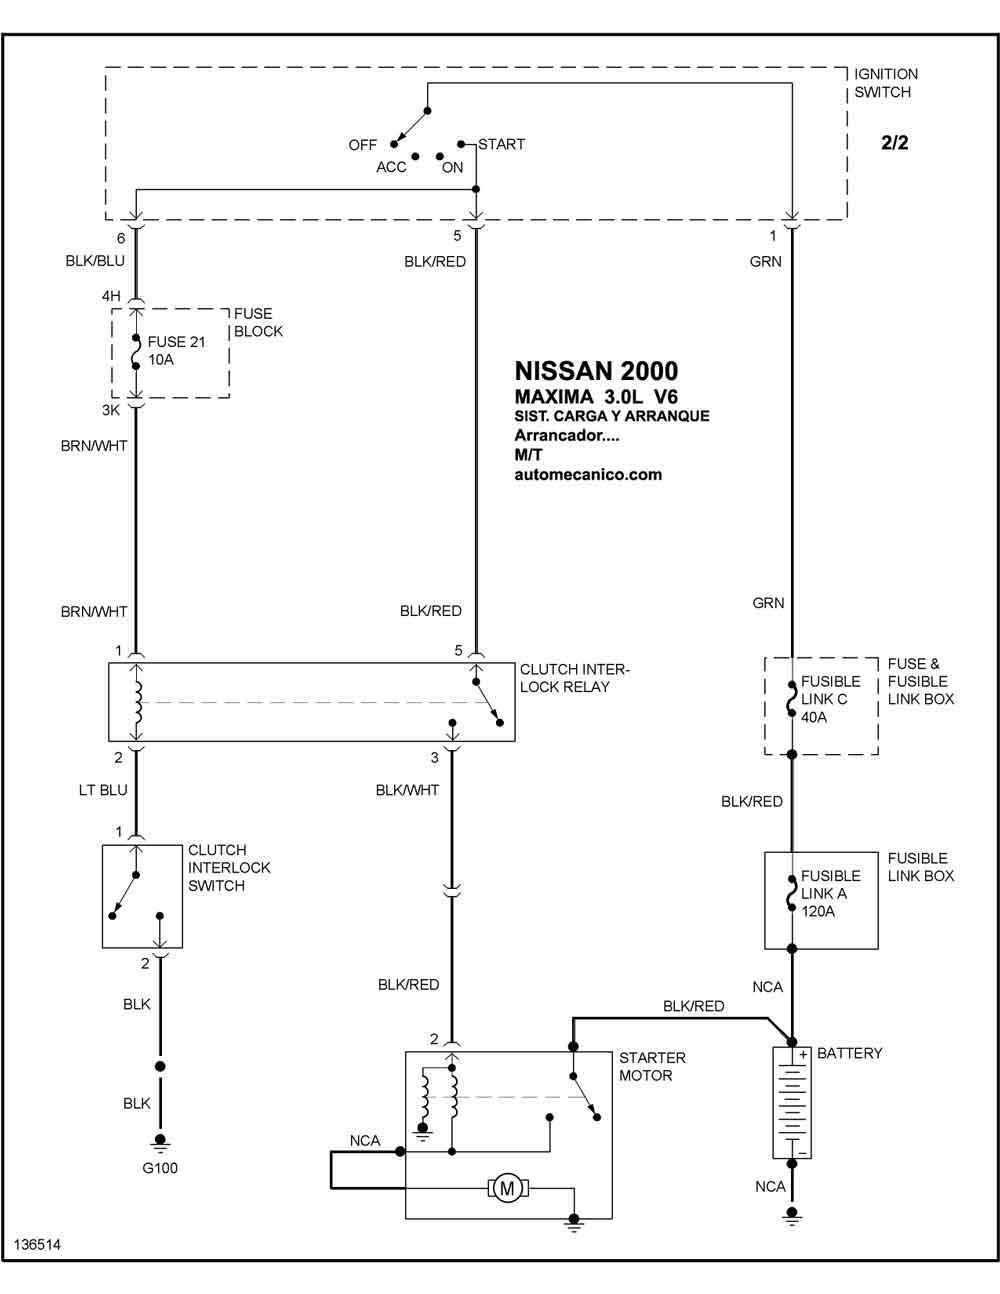 Diagrama Electrico Nissan Maxima 2000